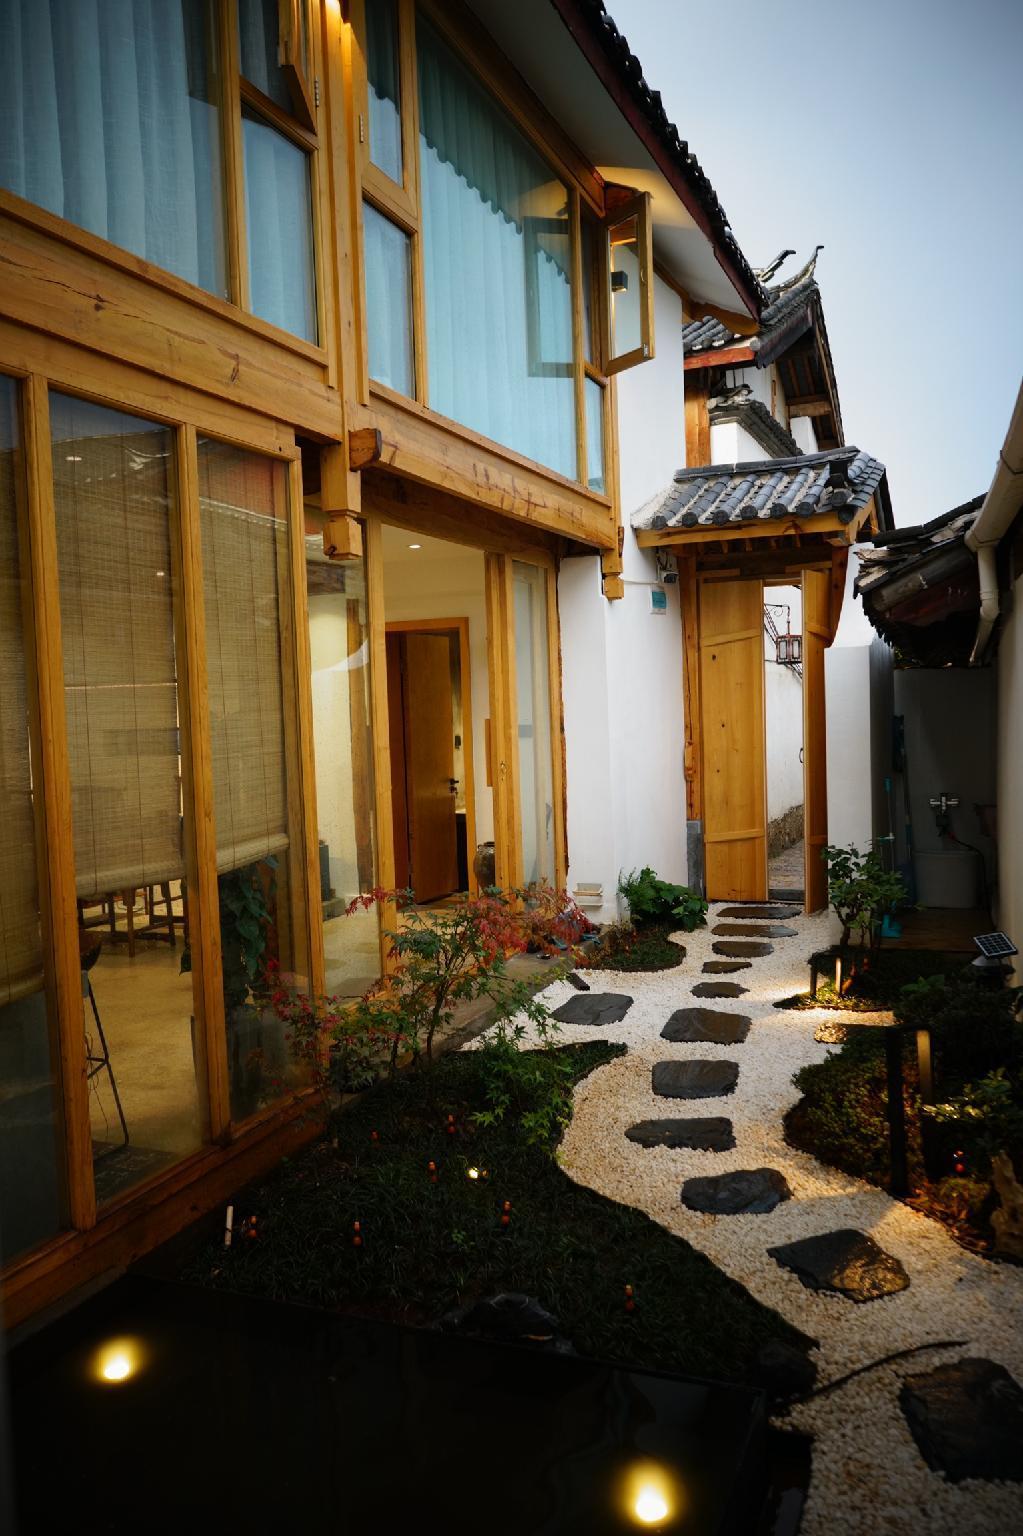 Garden Sunshine Villa In The Heart Of Old Town